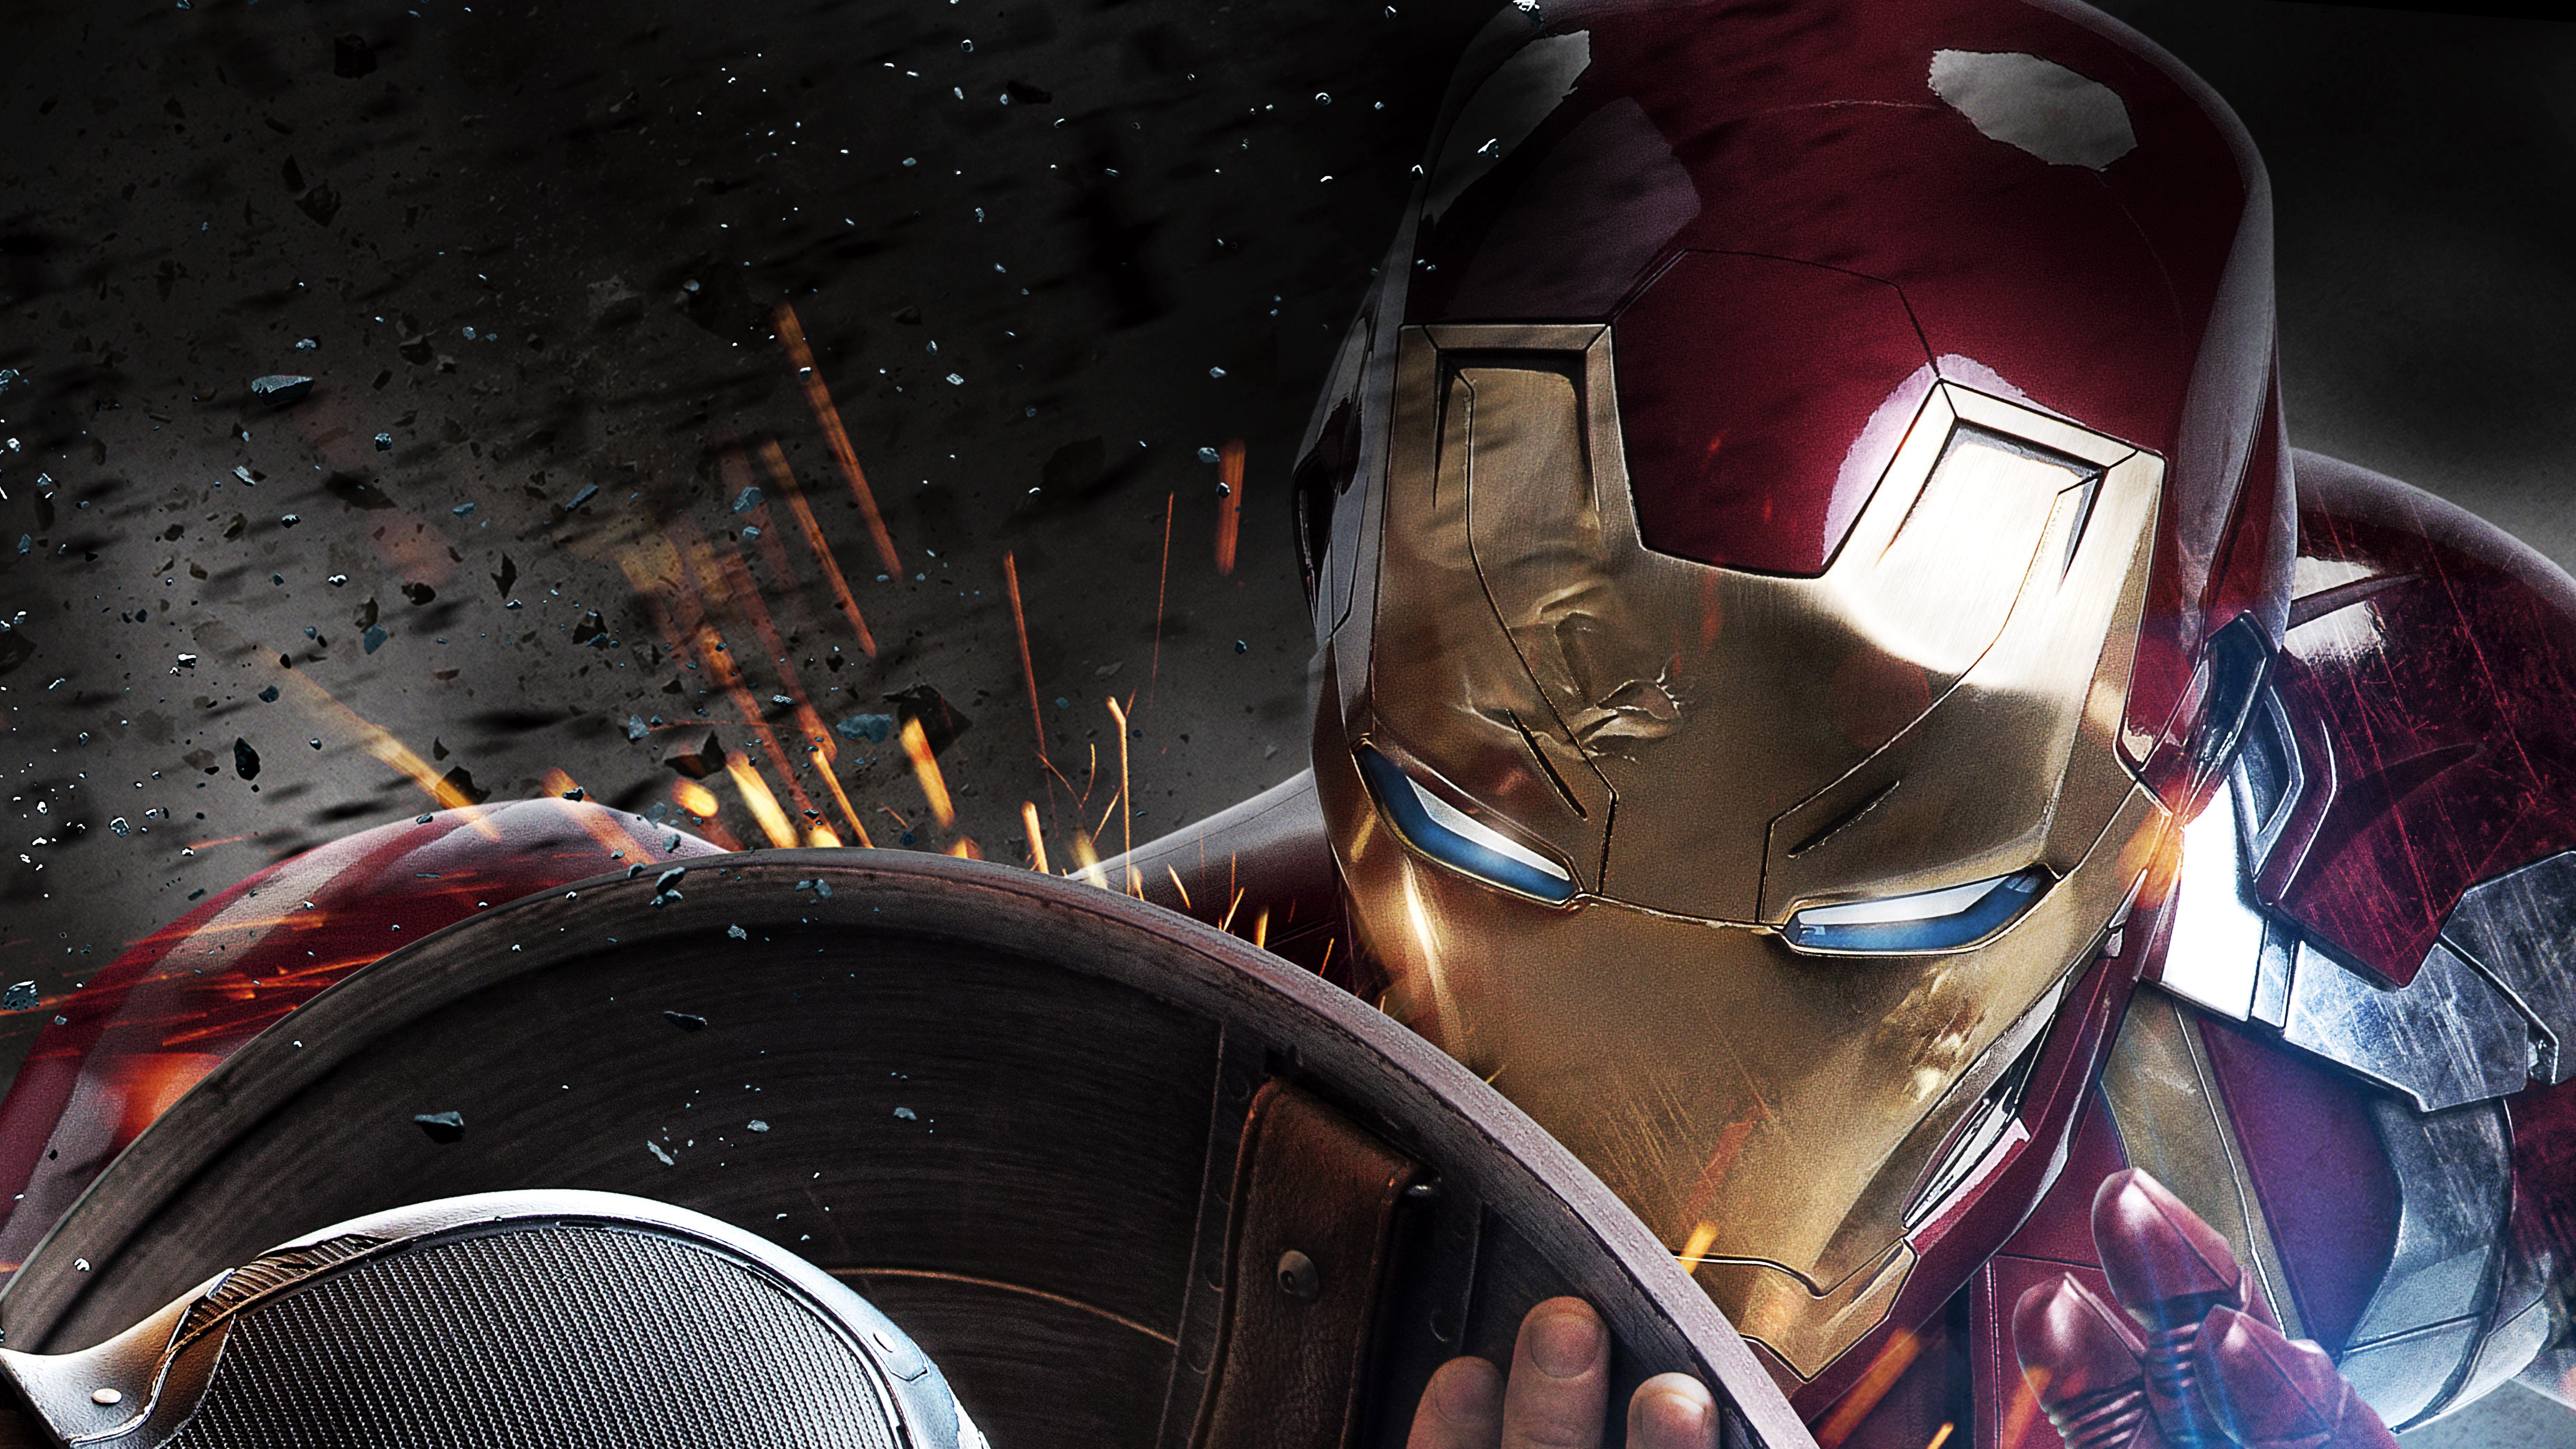 4k Superhero Wallpapers Top Free 4k Superhero Backgrounds Wallpaperaccess Iron Man Wallpaper Man Wallpaper Iron Man Hd Wallpaper